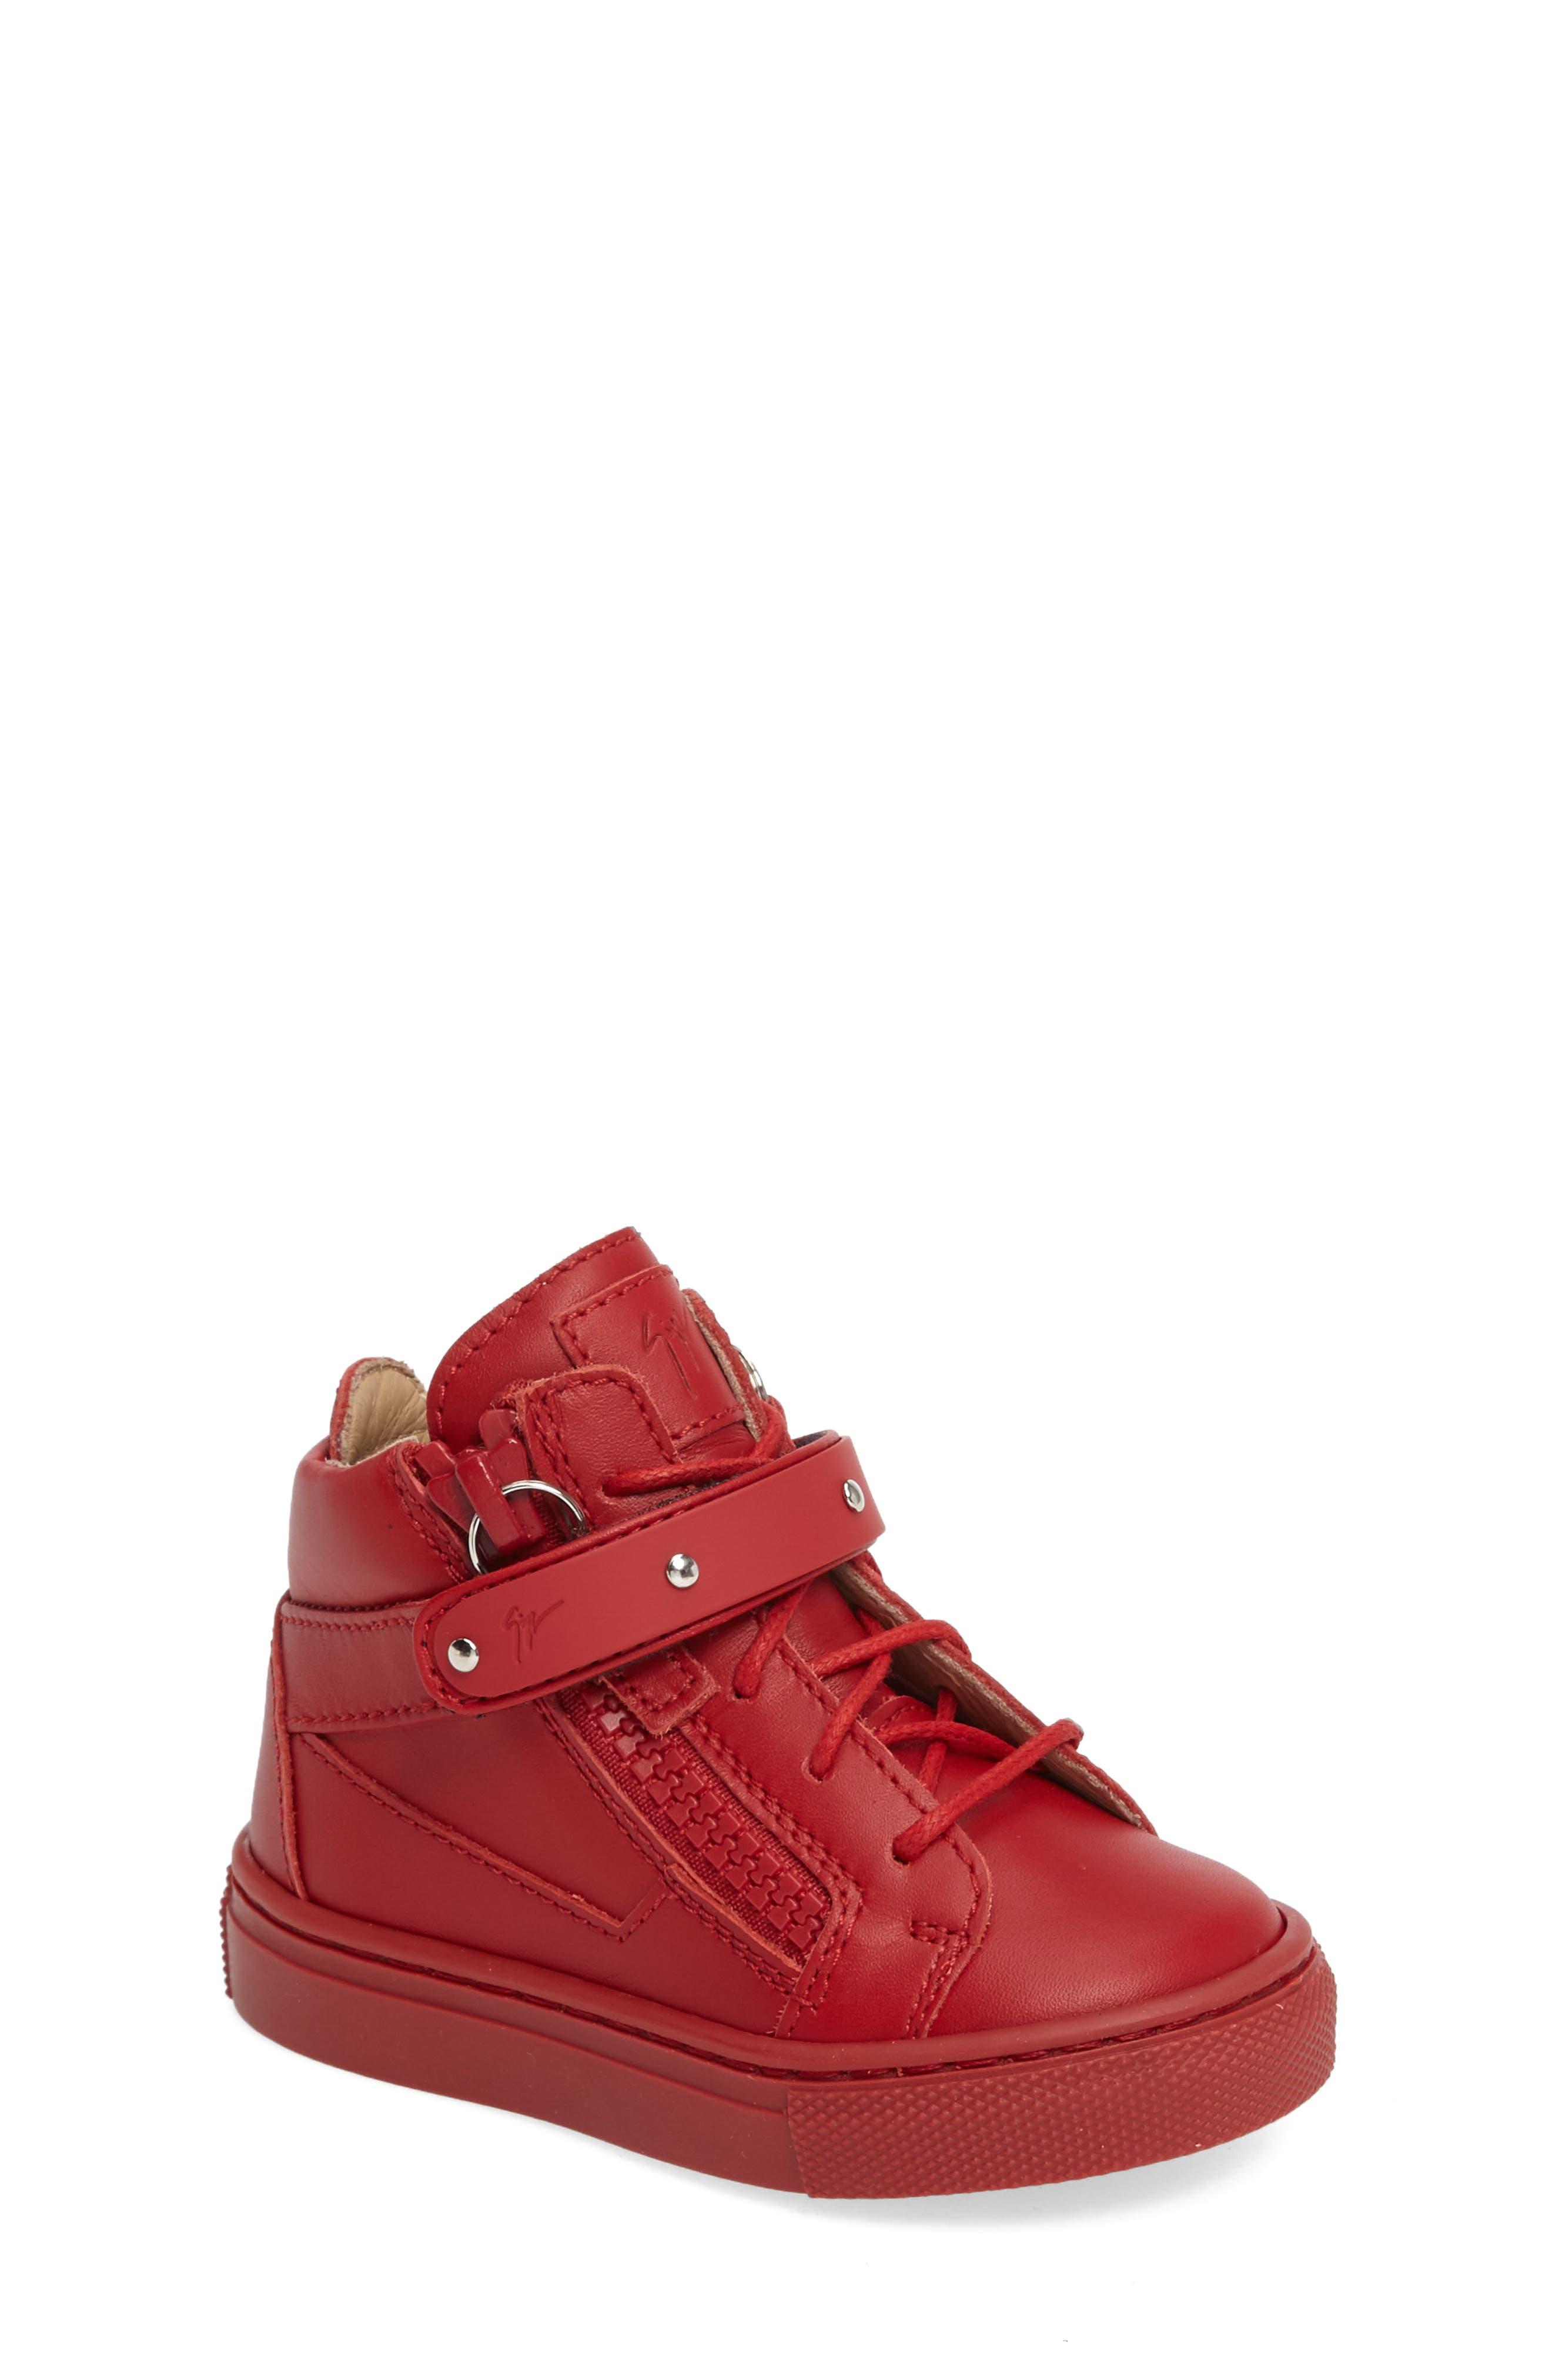 Taylor Junior High Top Sneaker,                         Main,                         color, 600